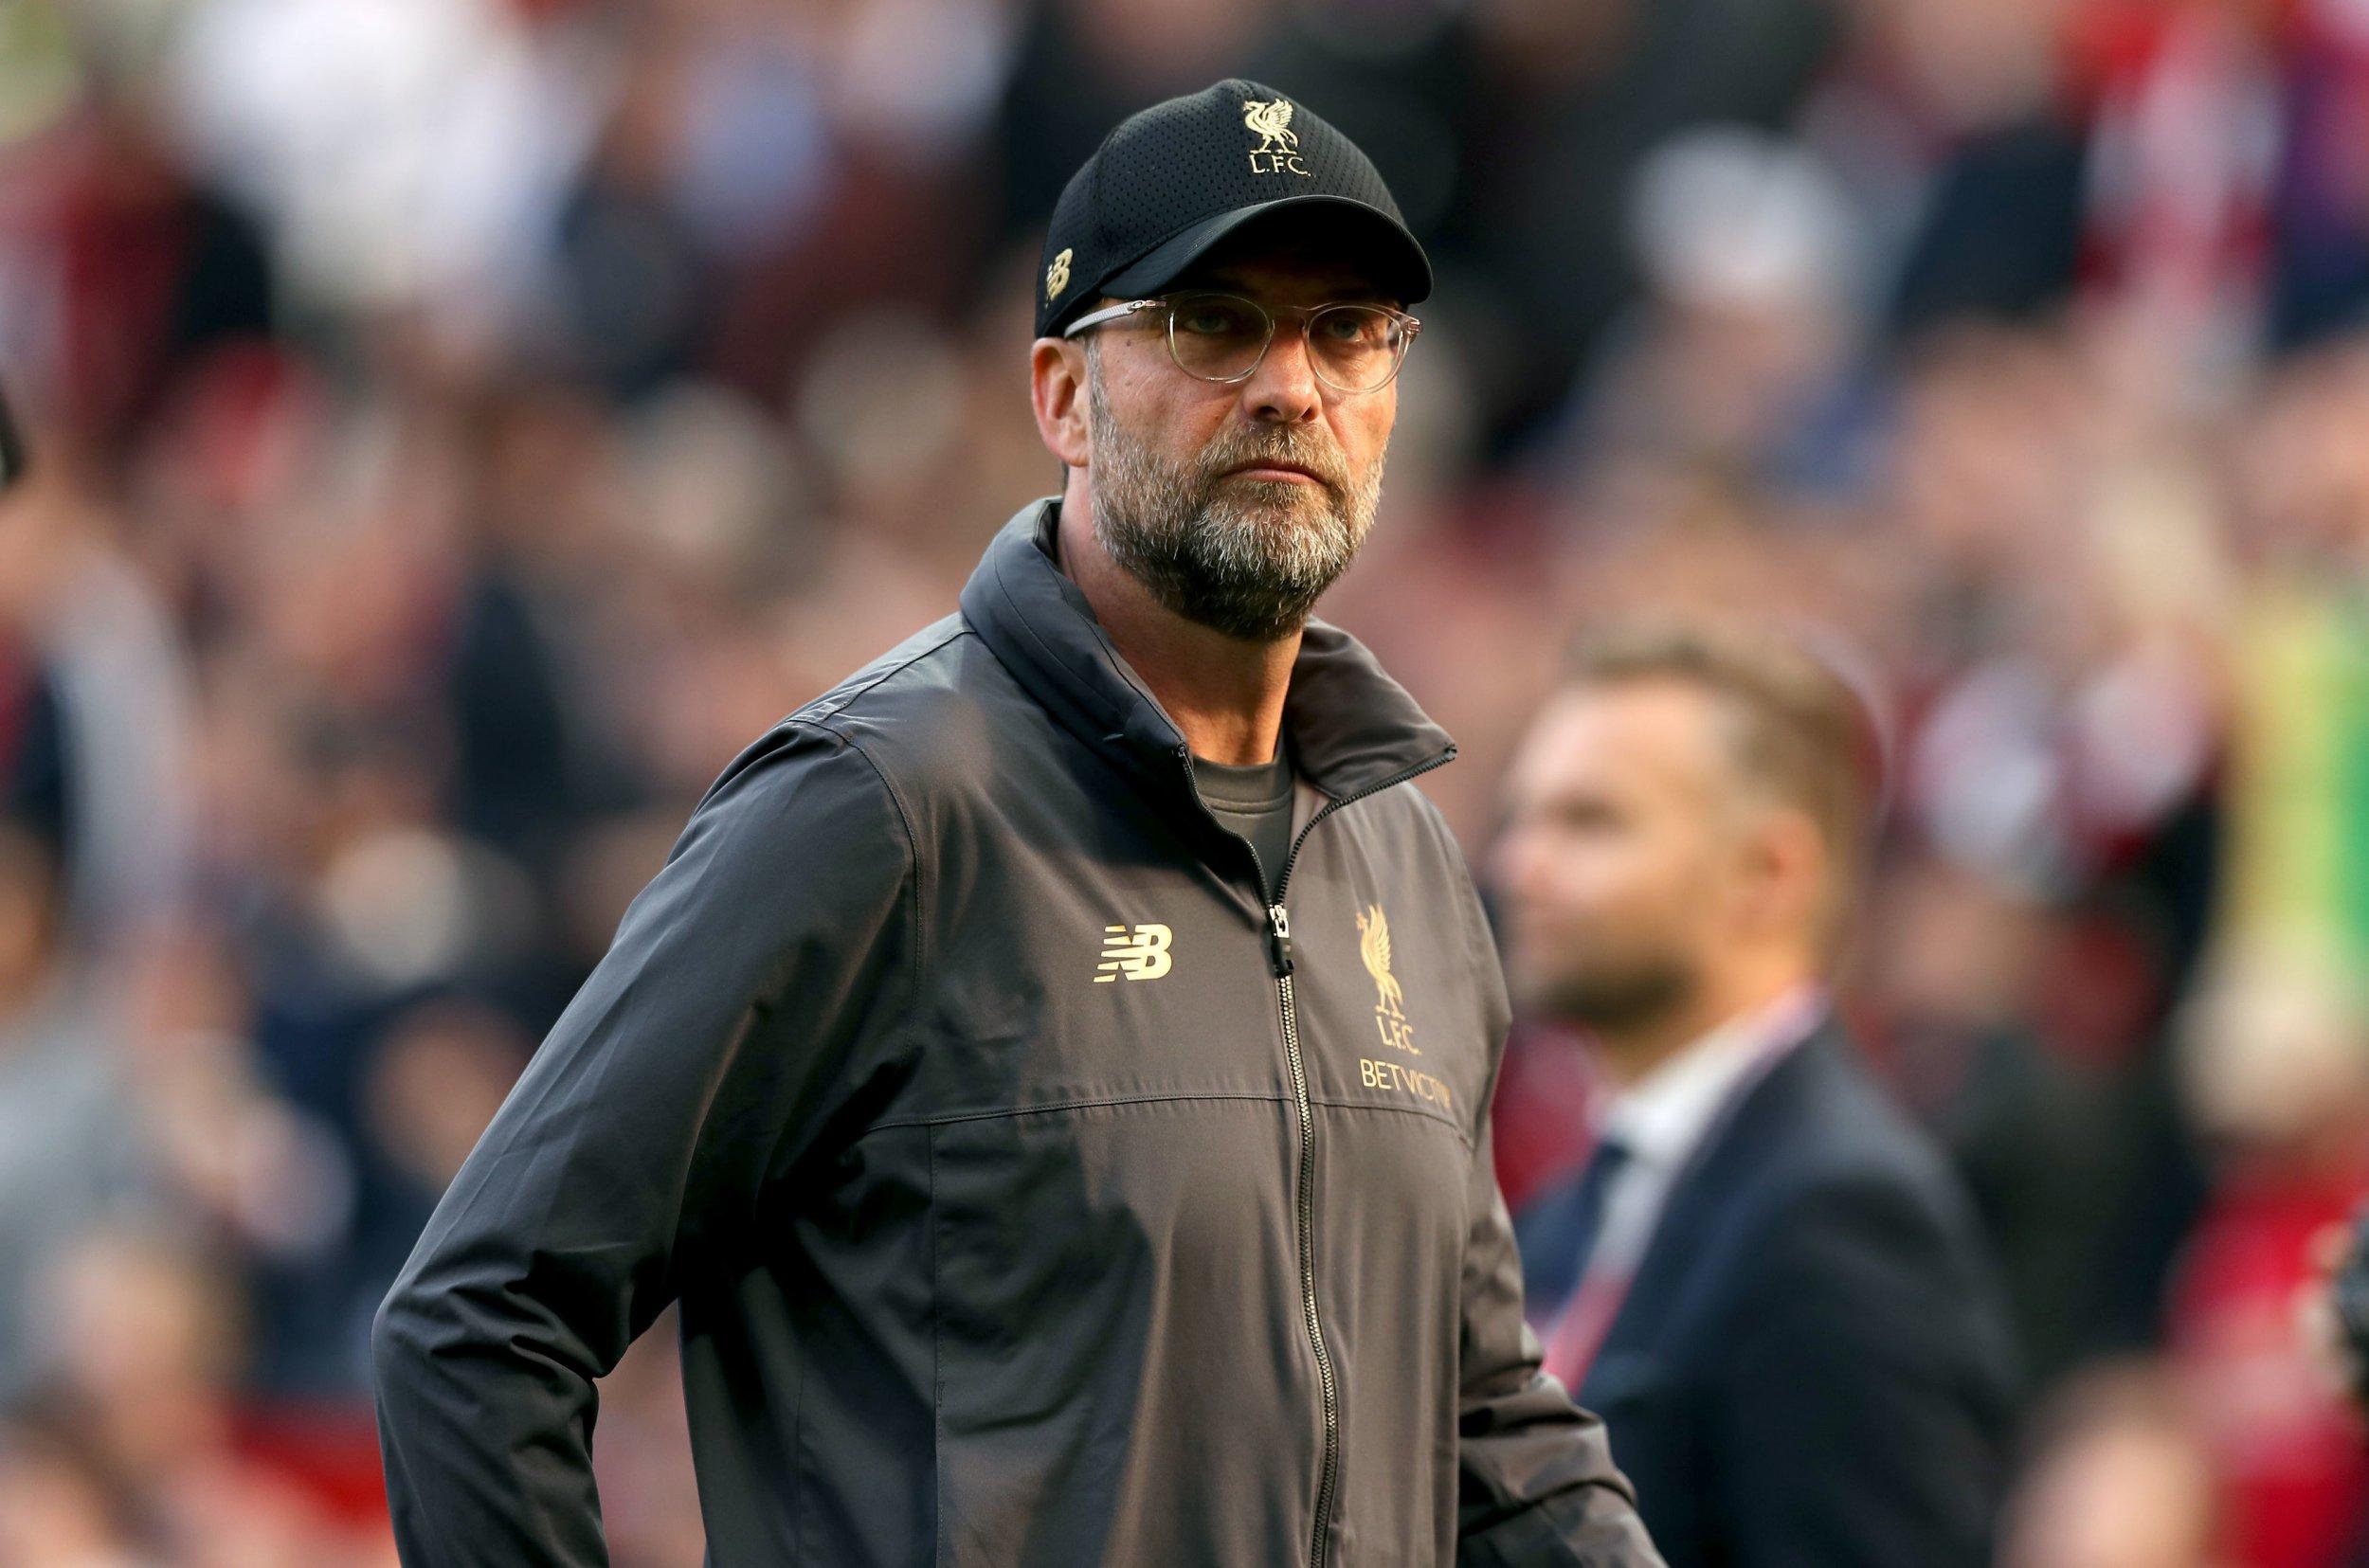 Liverpool manager Jurgen Klopp fuming with Jordan Henderson and Sadio Mane after Man Utd draw